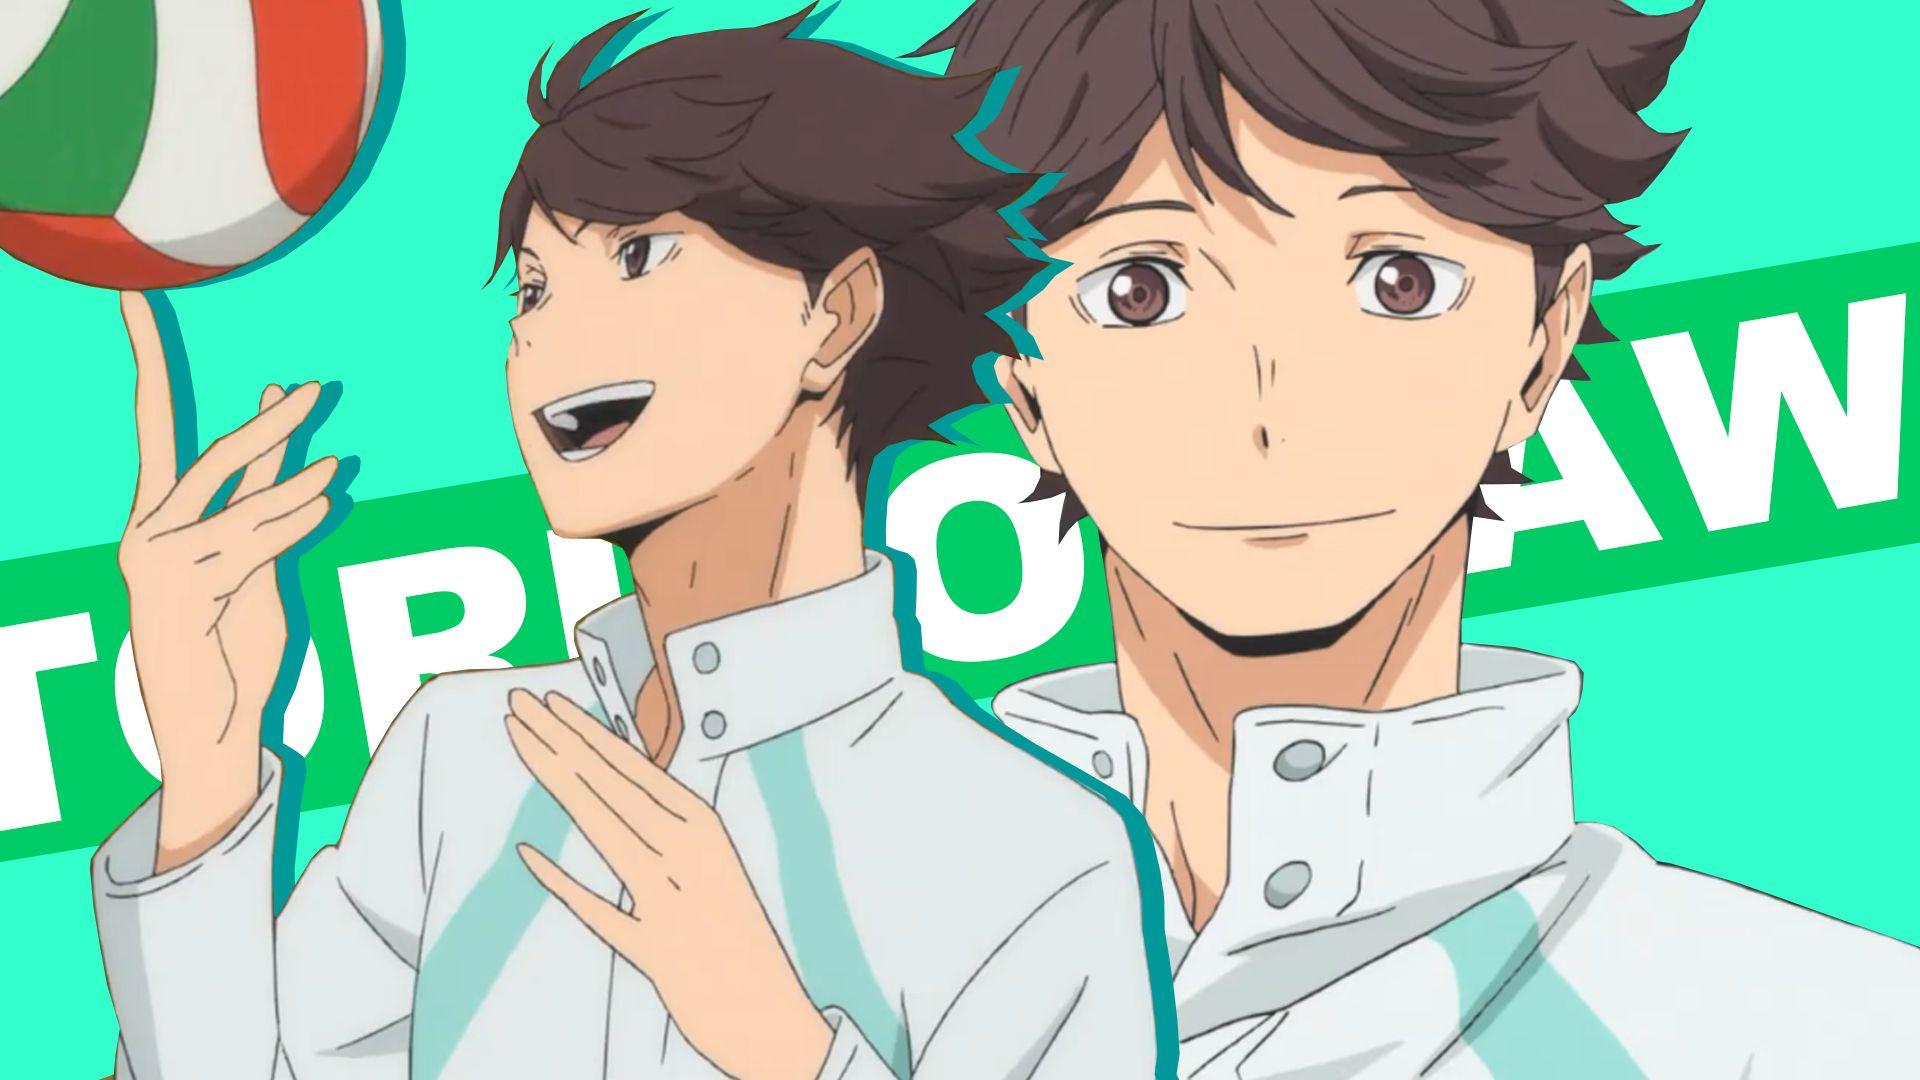 Toru Oikawa Anime Haikyuu Wallpaper Hd Haikyuu Wallpaper Haikyuu Anime